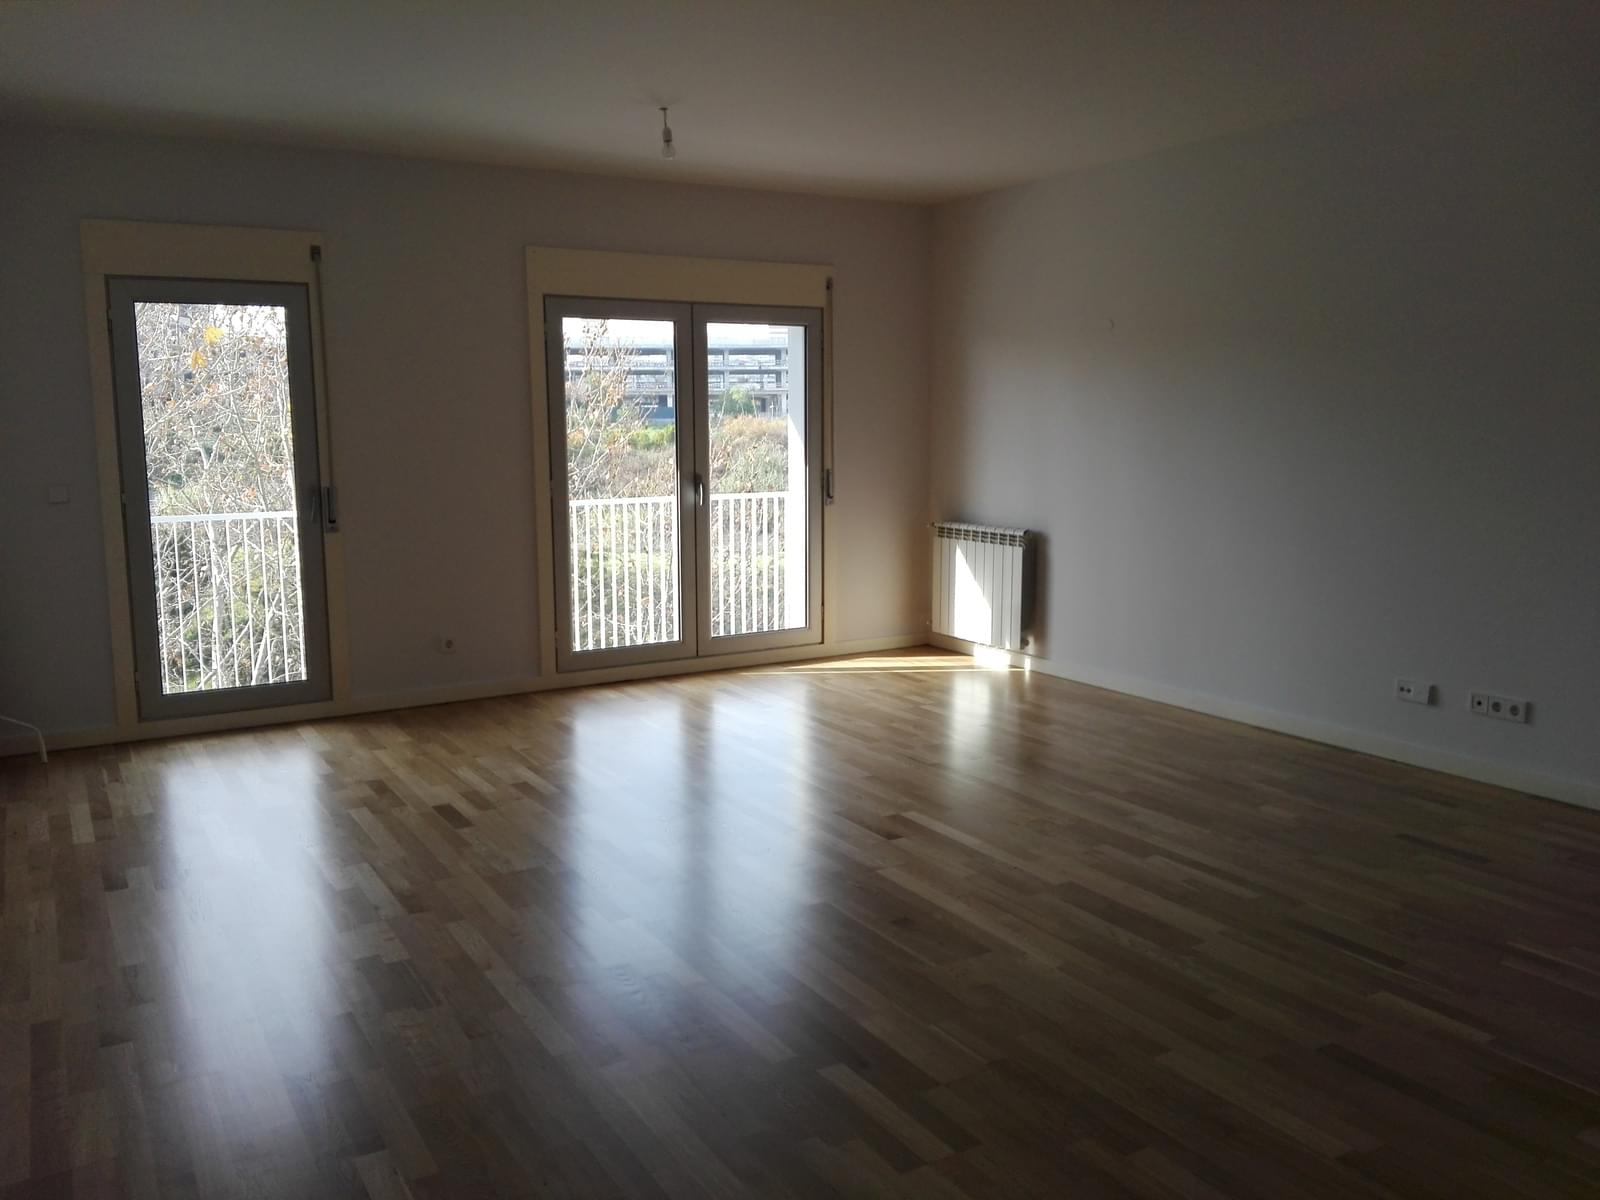 pf18814-apartamento-t2-lisboa-c0eb54e6-2806-4617-8c86-cbb9760707bd